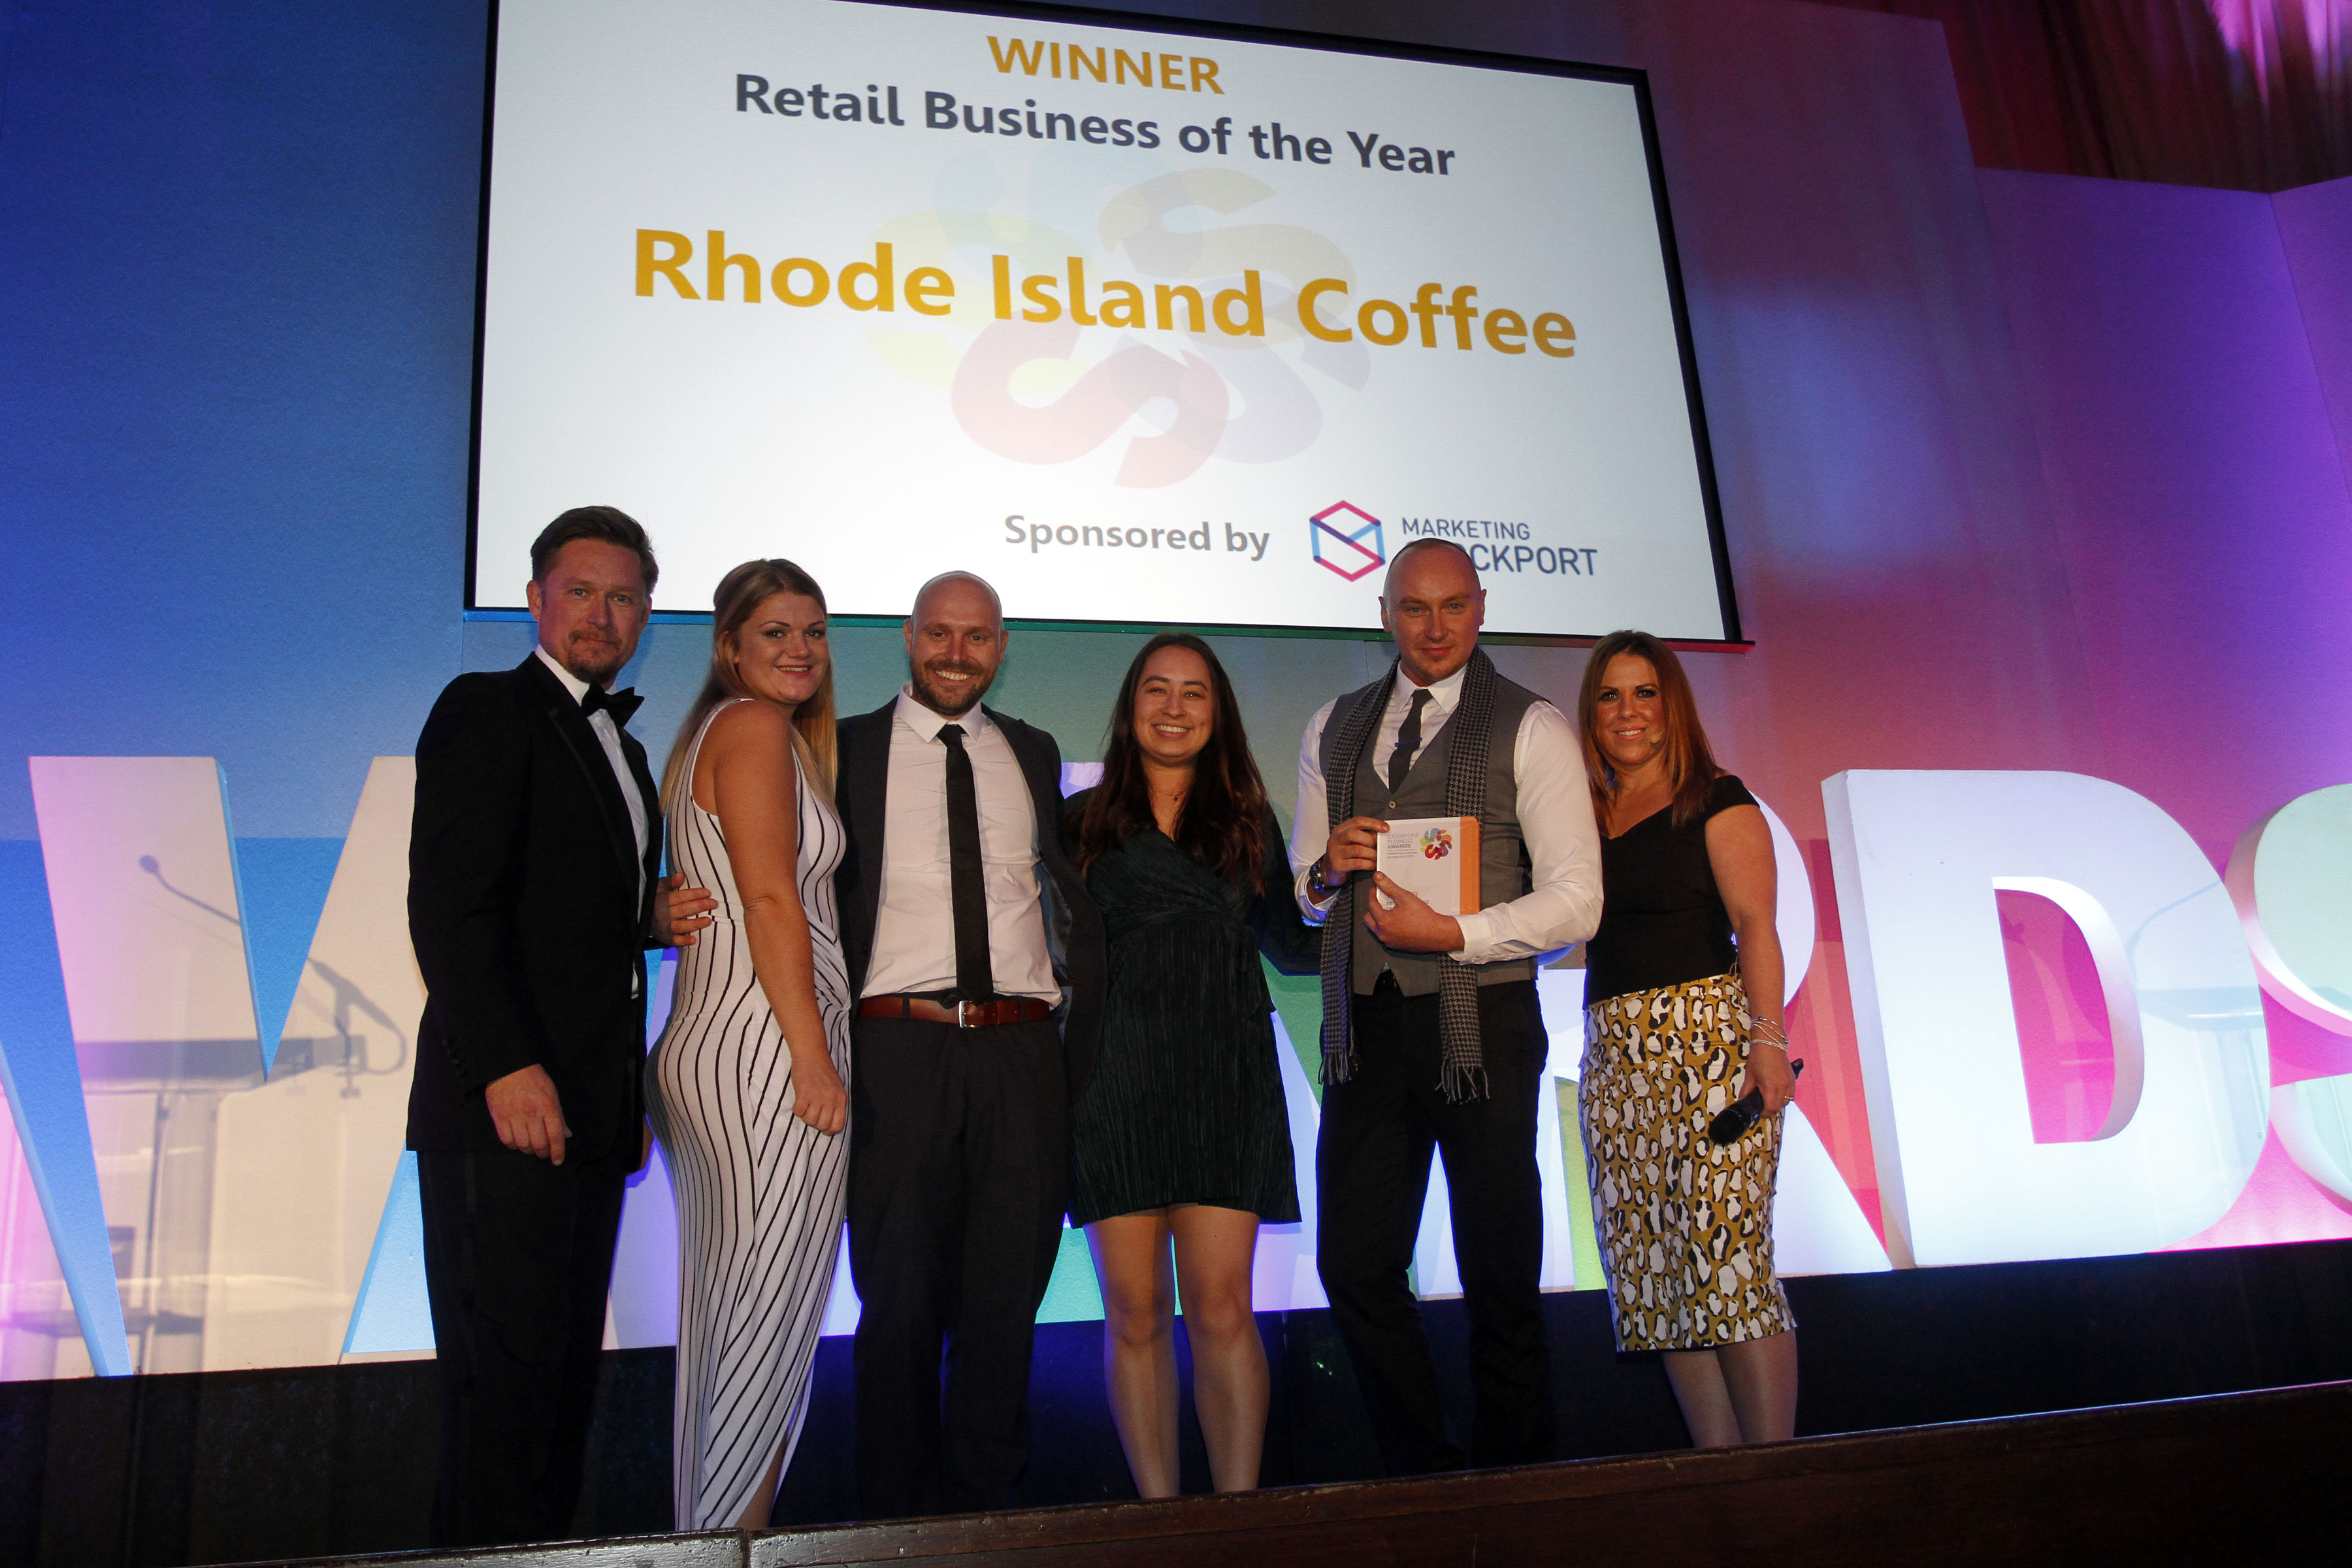 Rhode Island Coffee Stockport